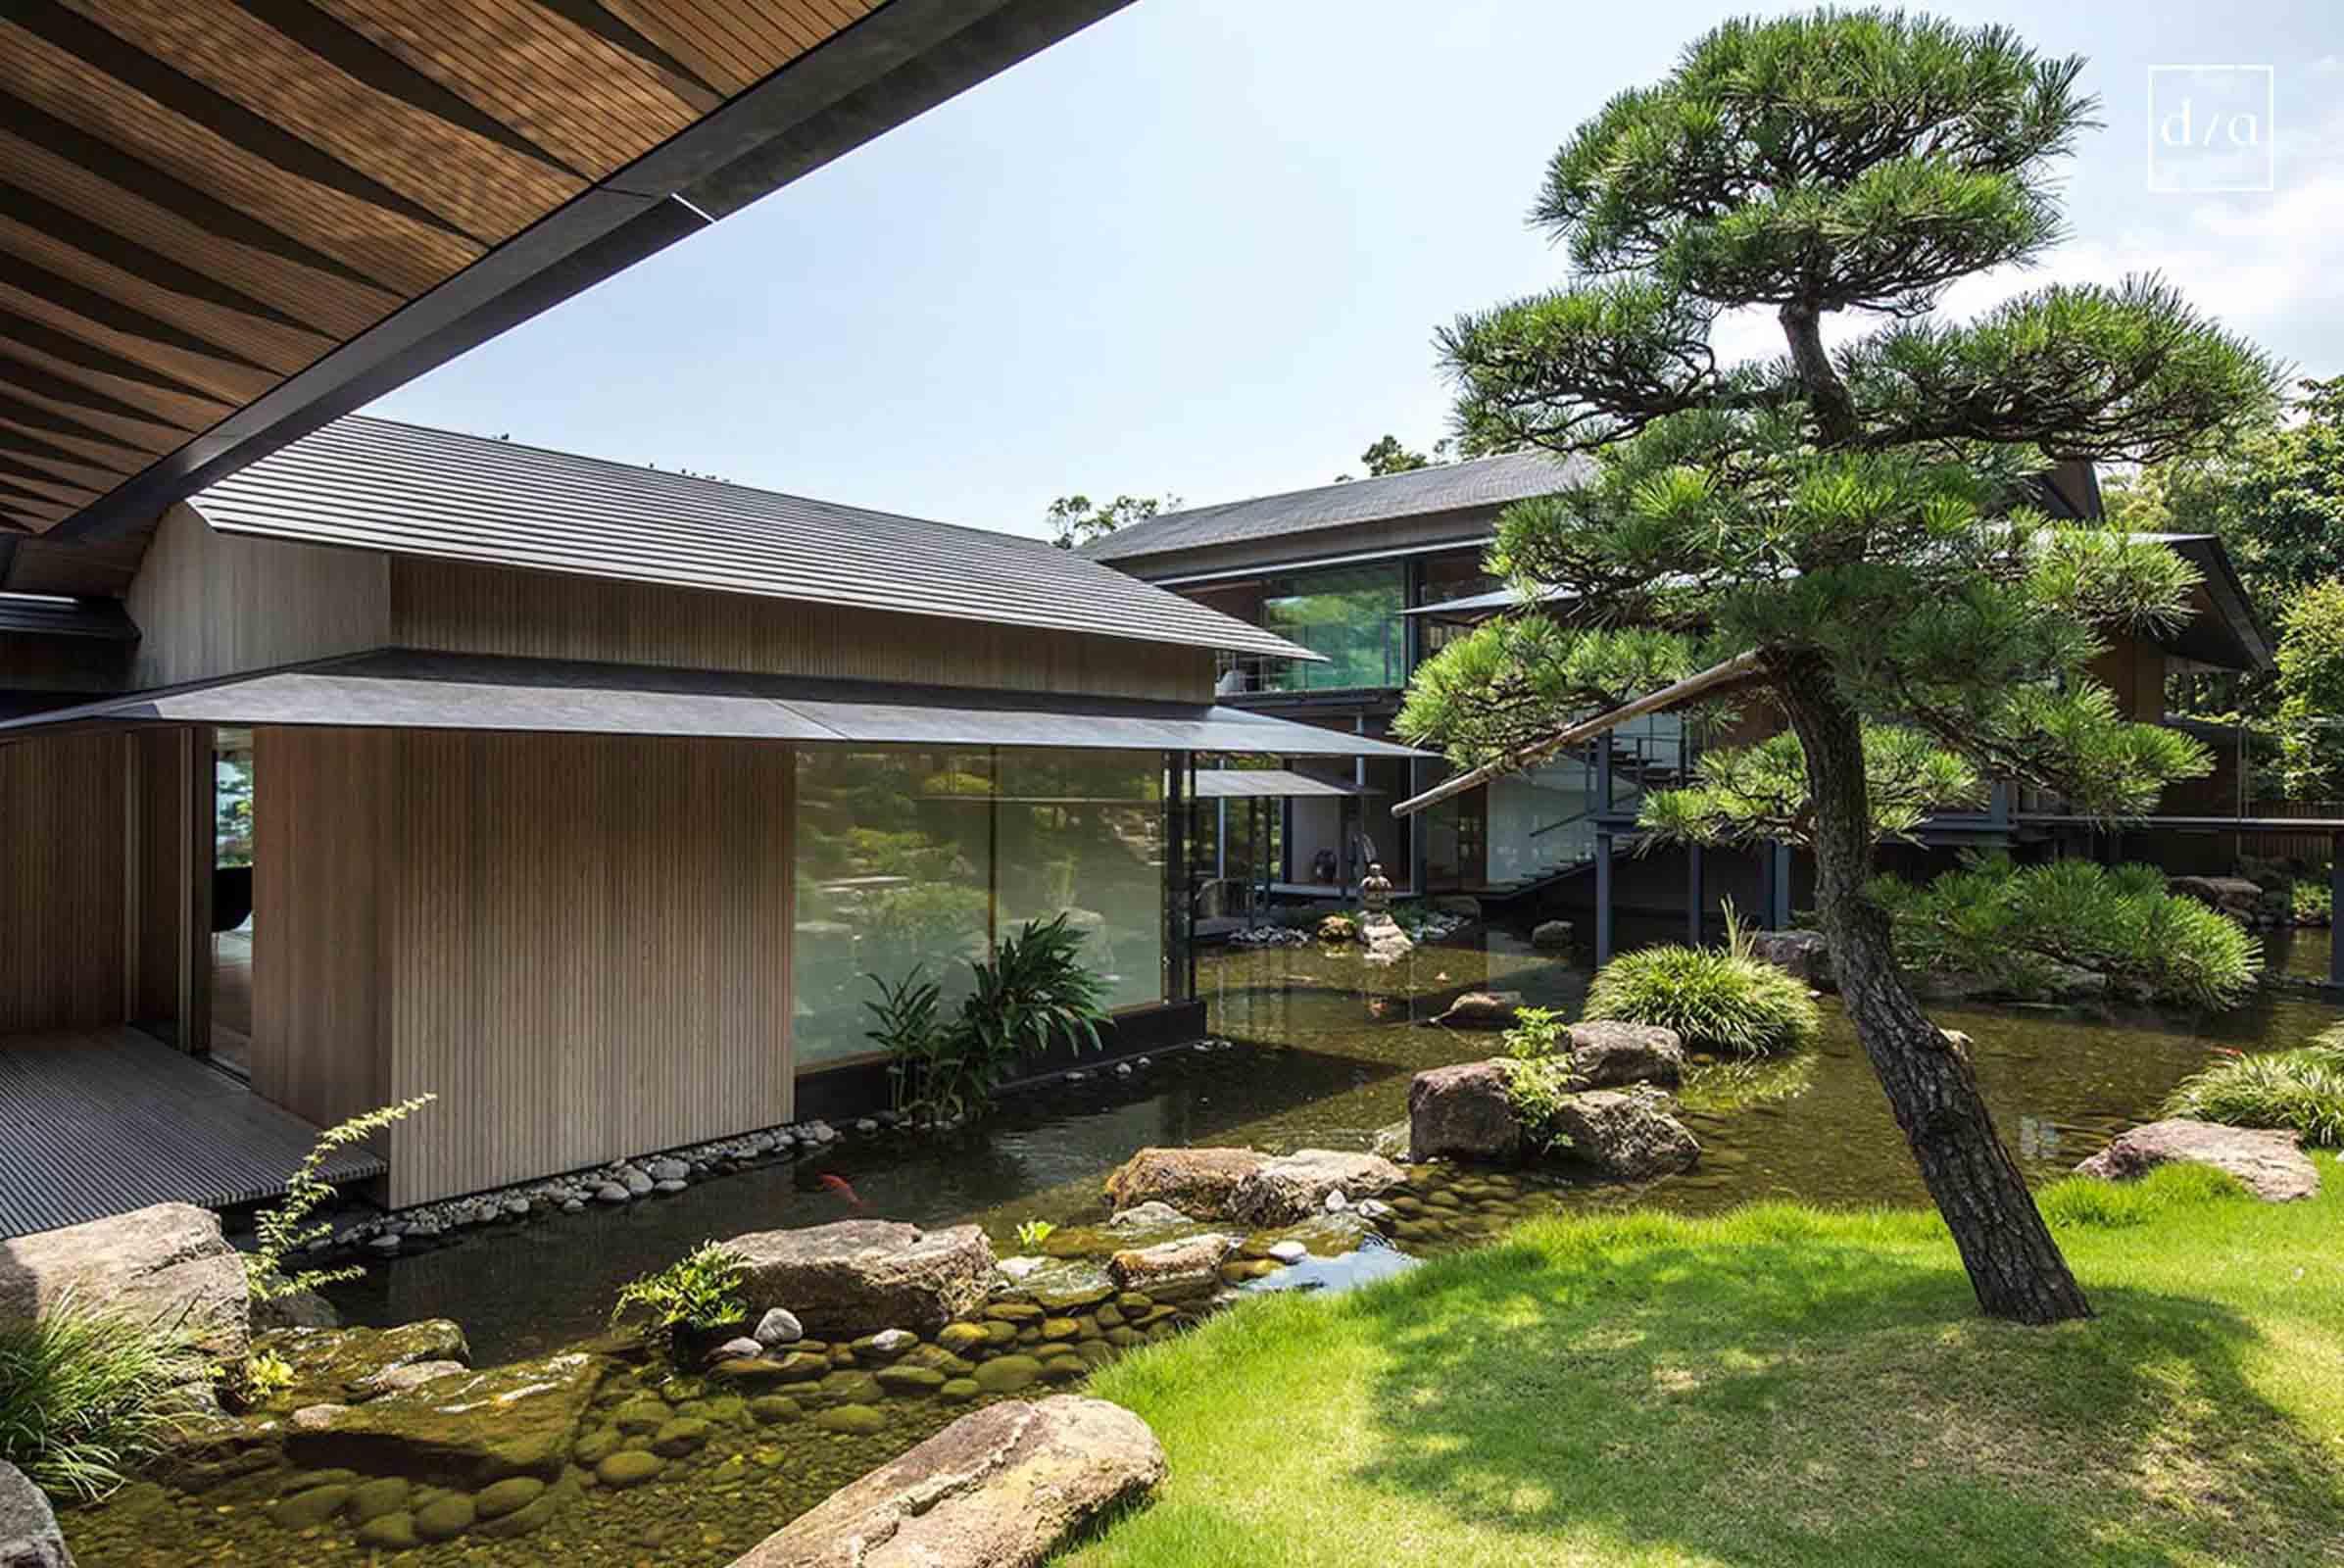 Japan home 12.jpg